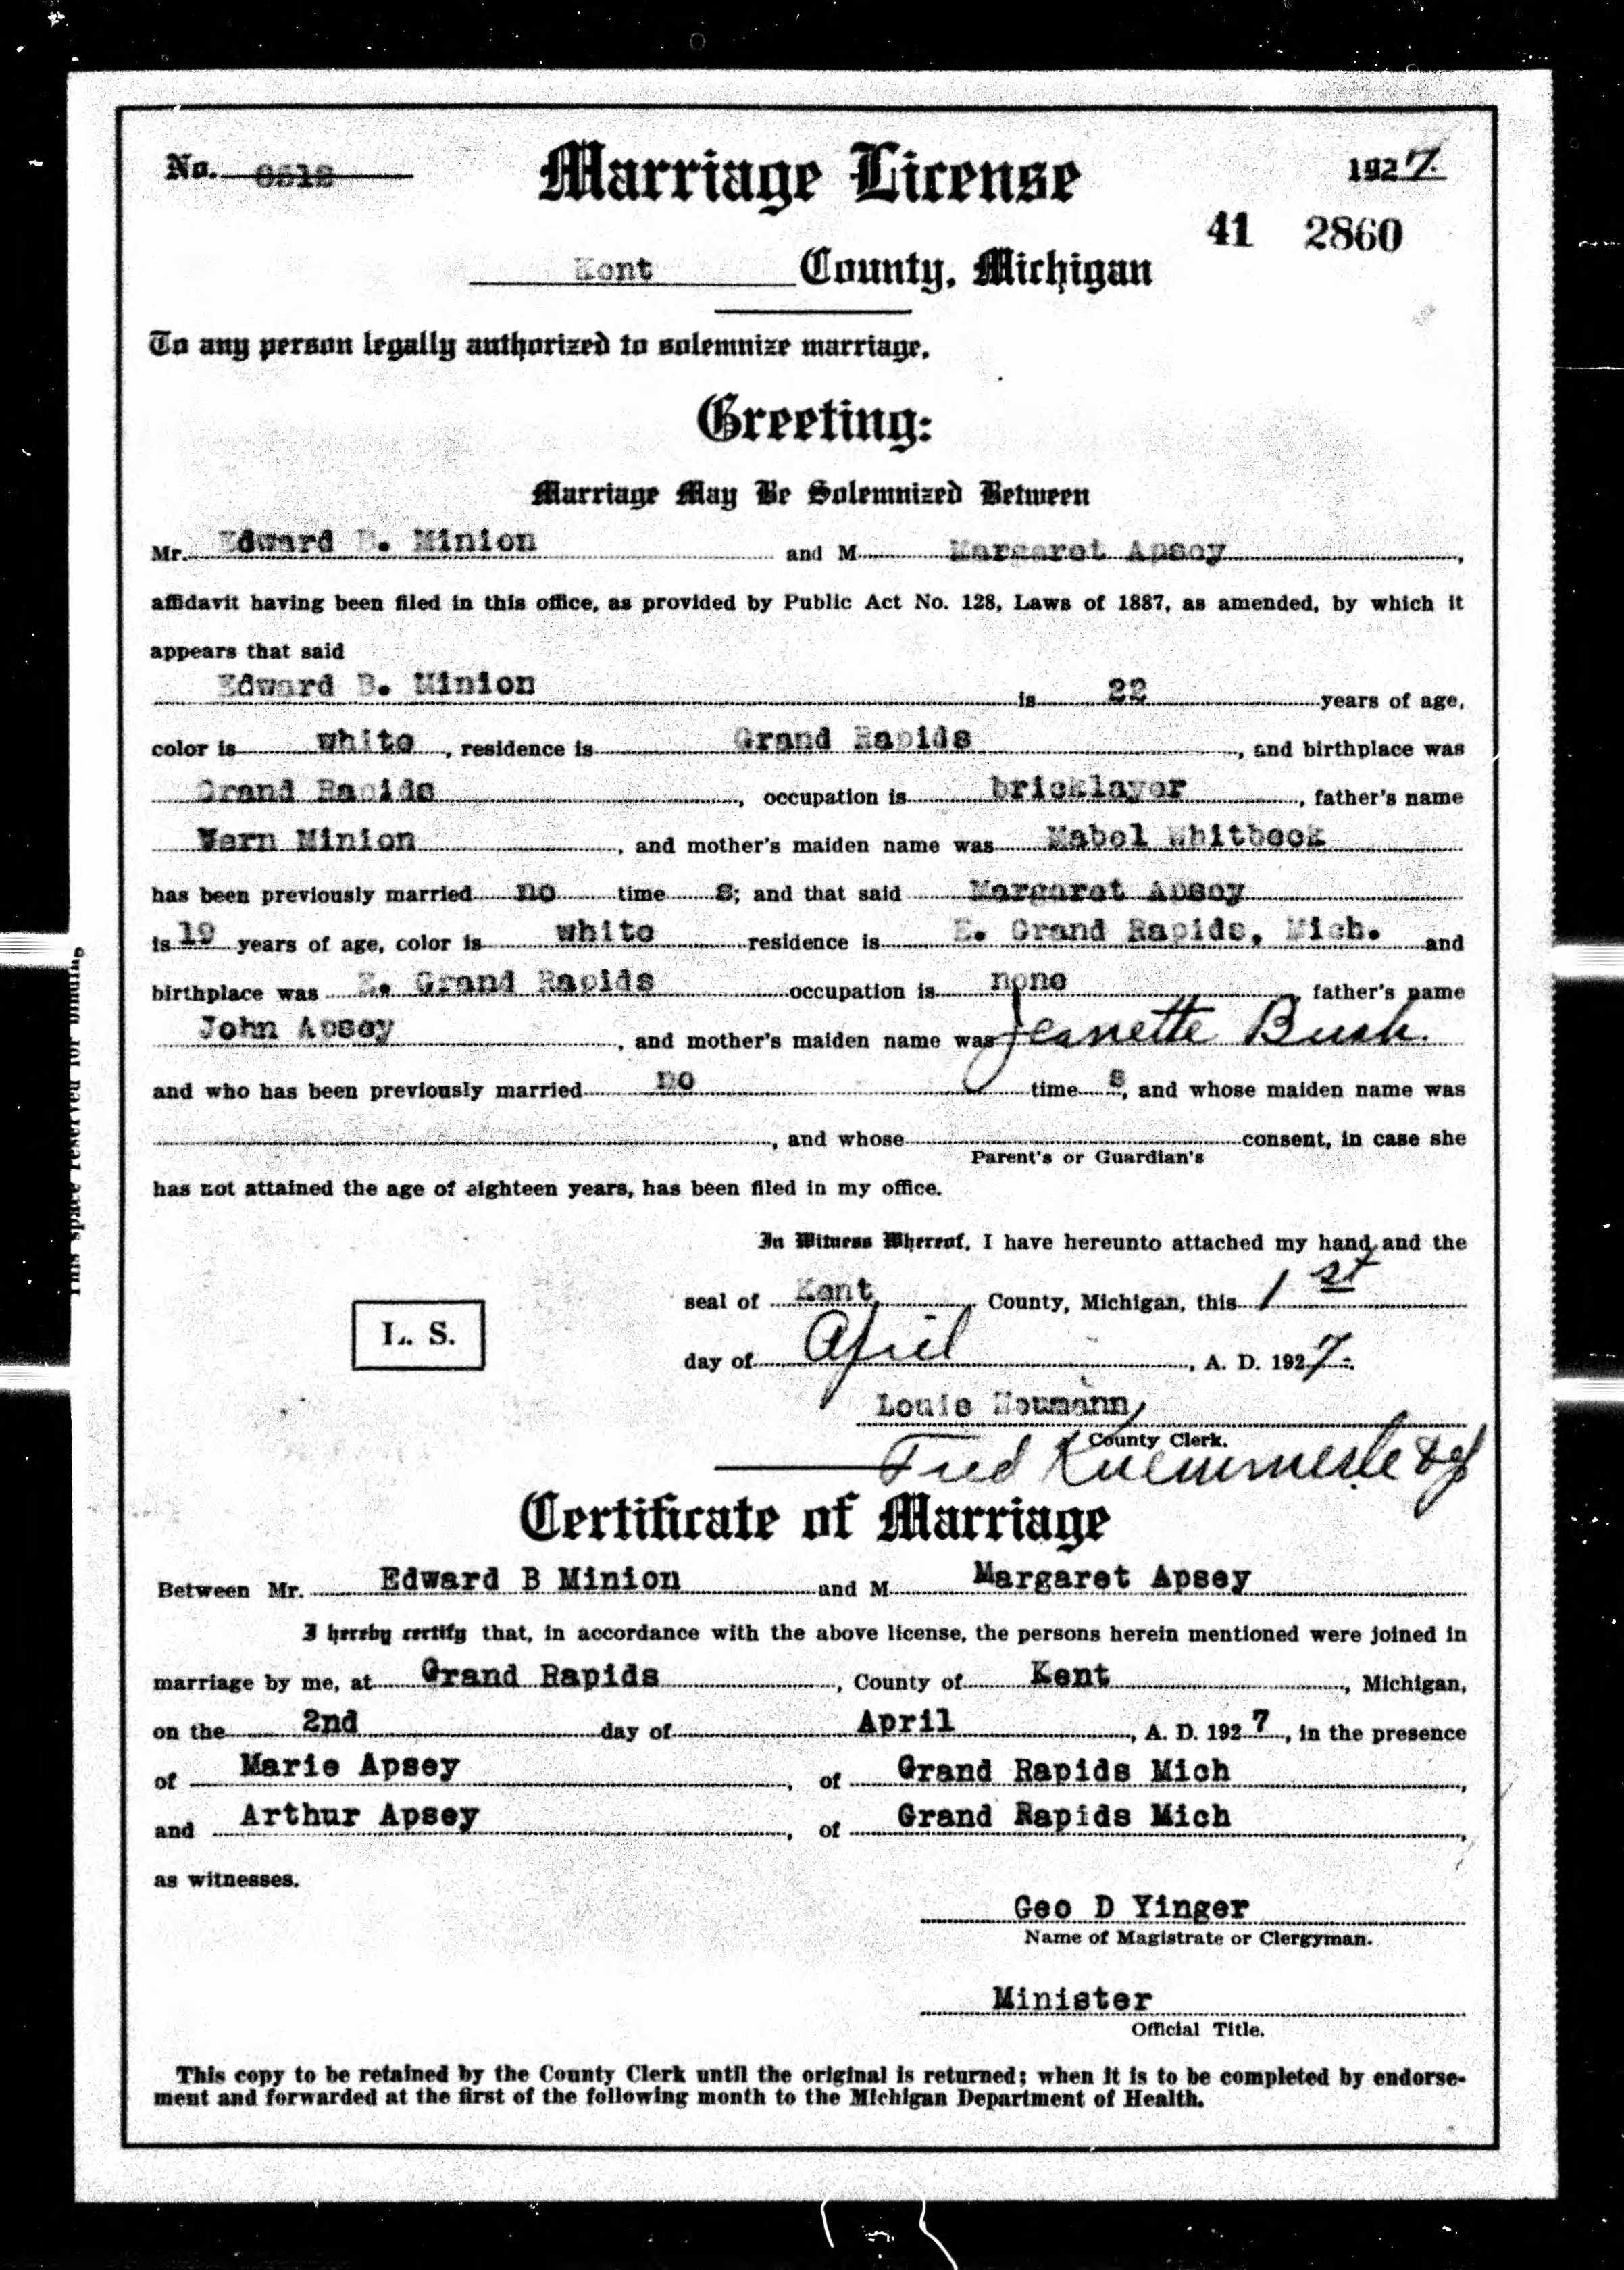 margaret apsey ed minion marriage